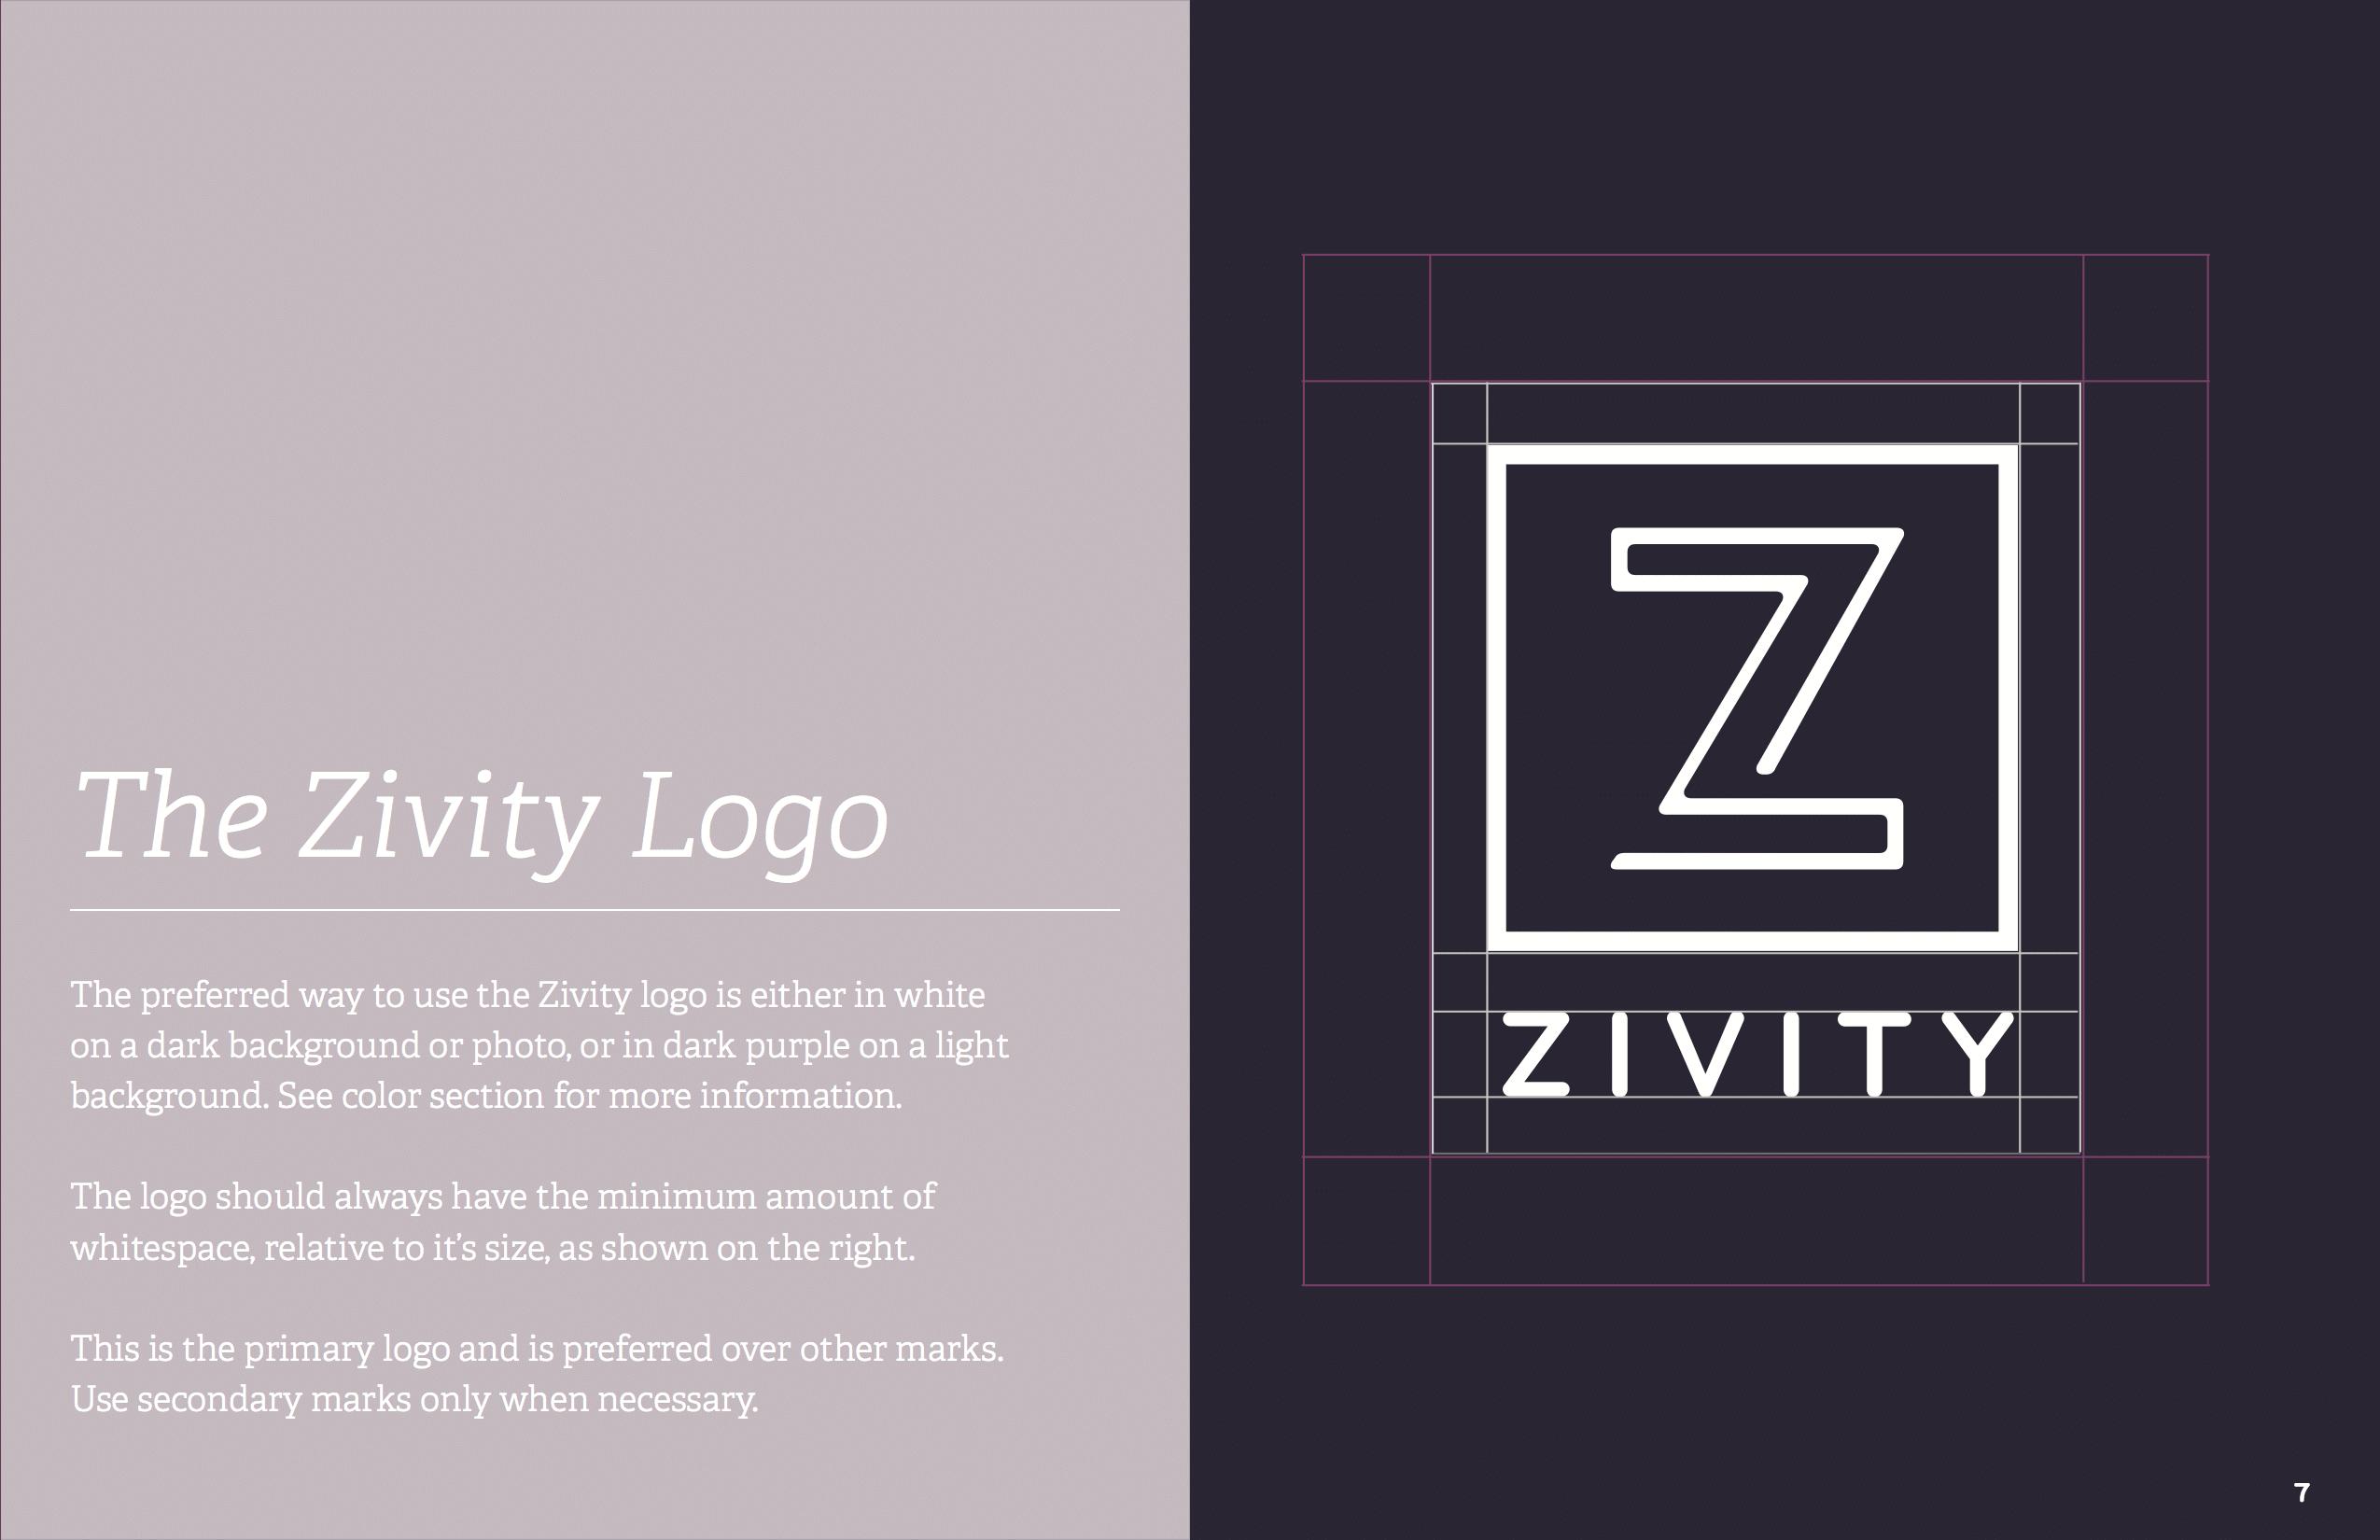 Zivity - image 7 - student project